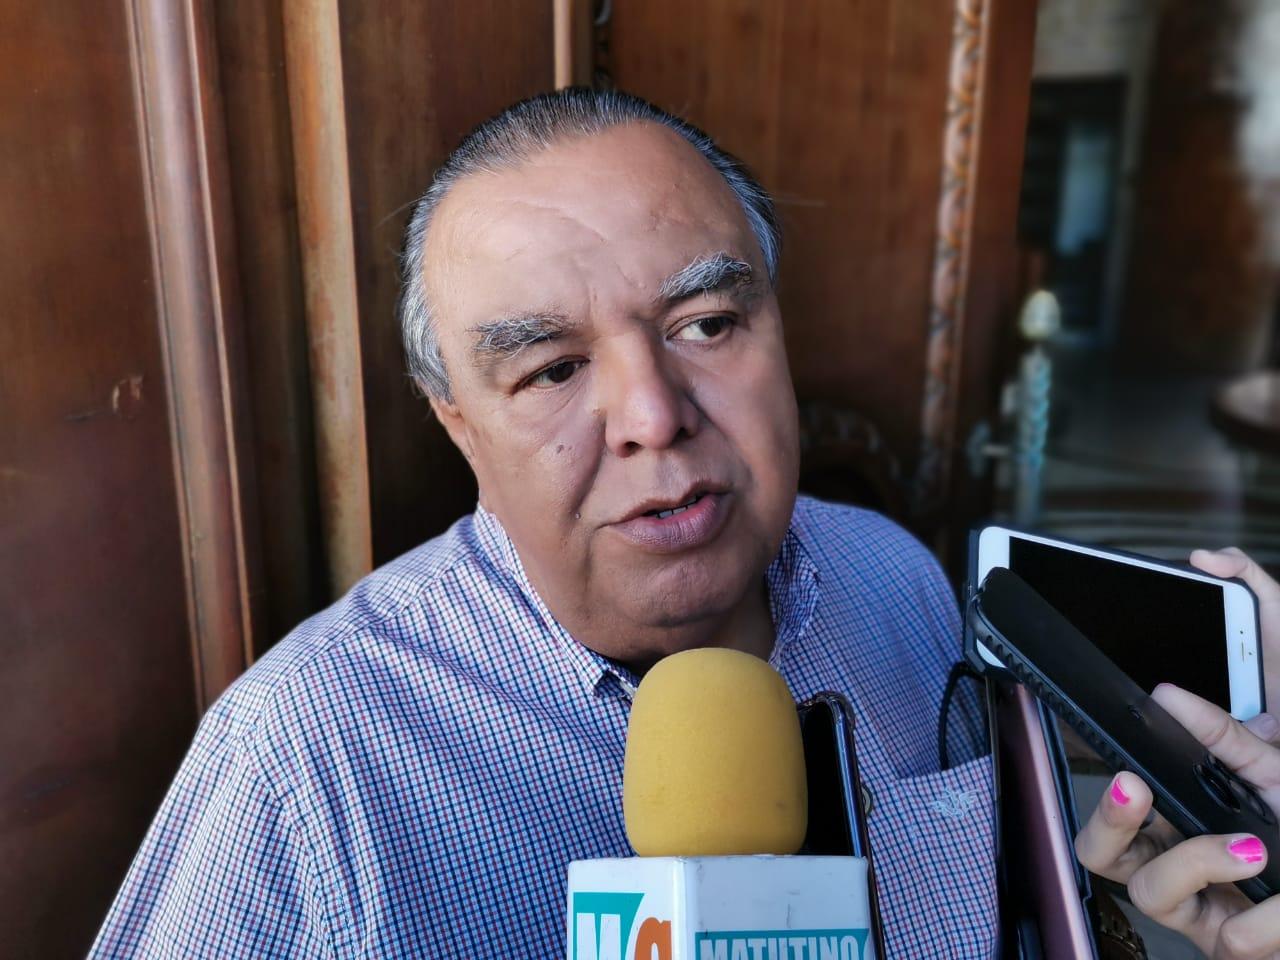 Jorge Benito Rodríguez